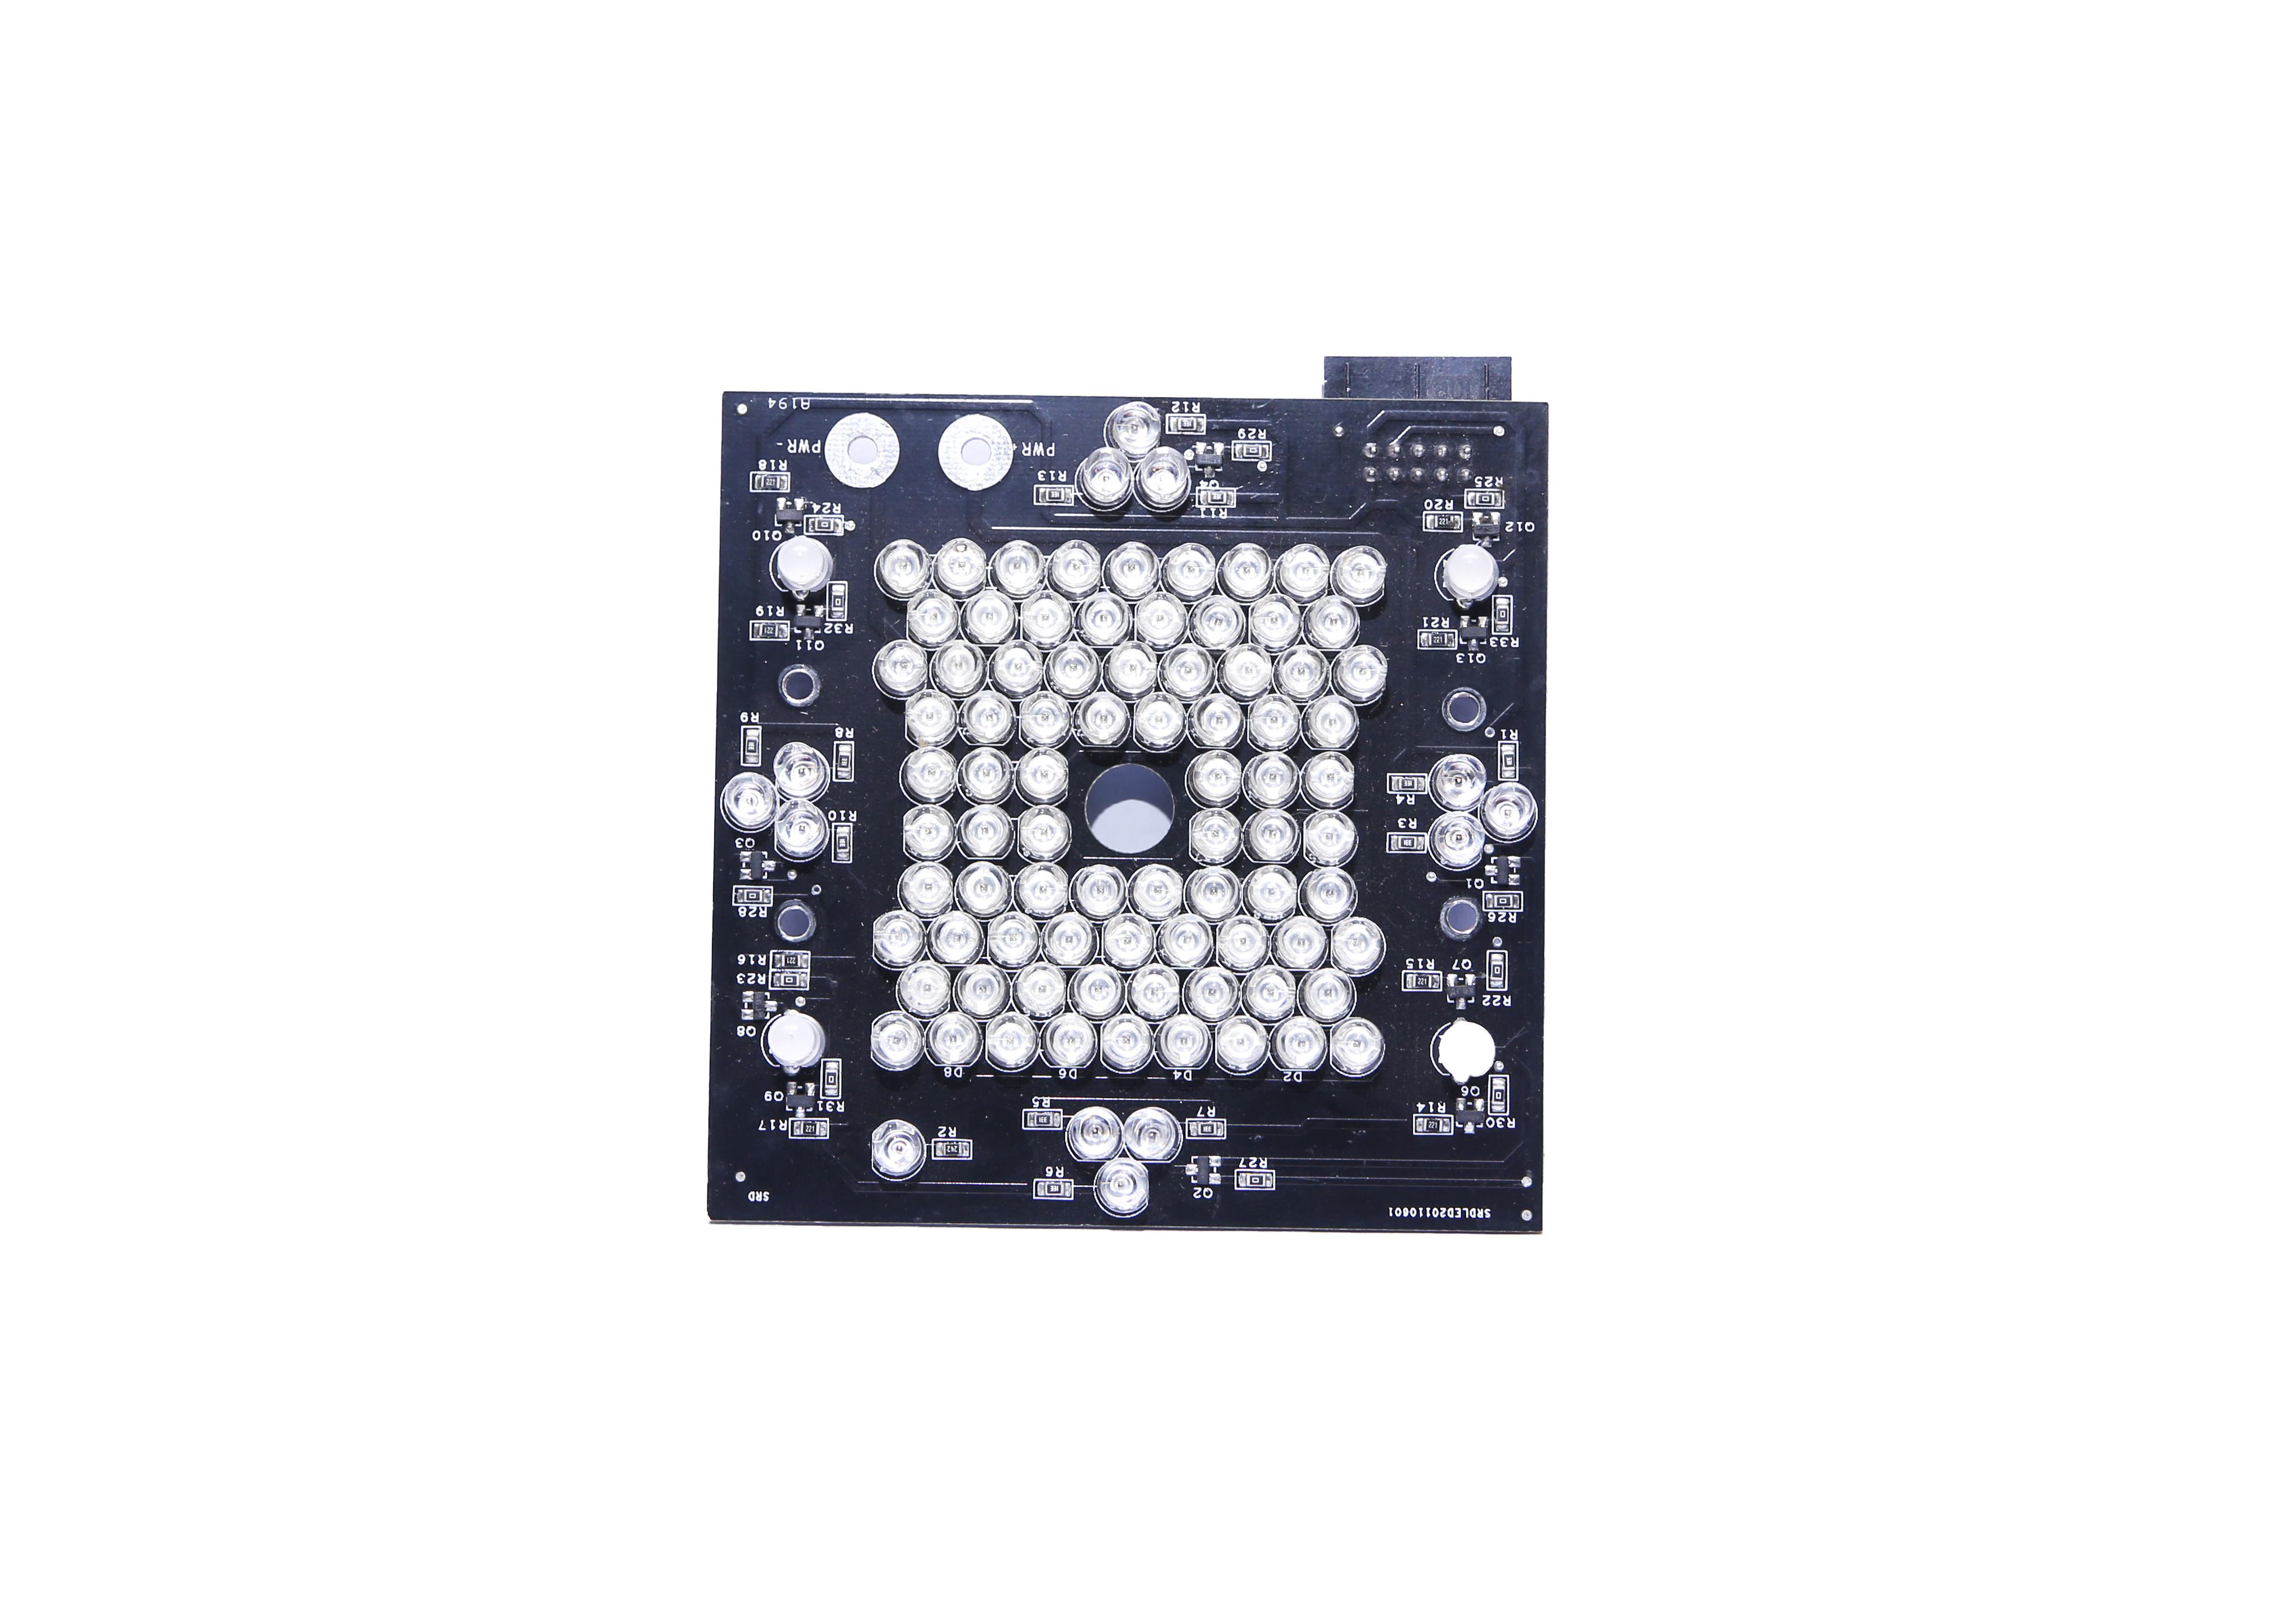 3D四轮定位仪相机灯板 LED灯板 杰奔Johnbean 霍夫曼 仿杰奔灯板